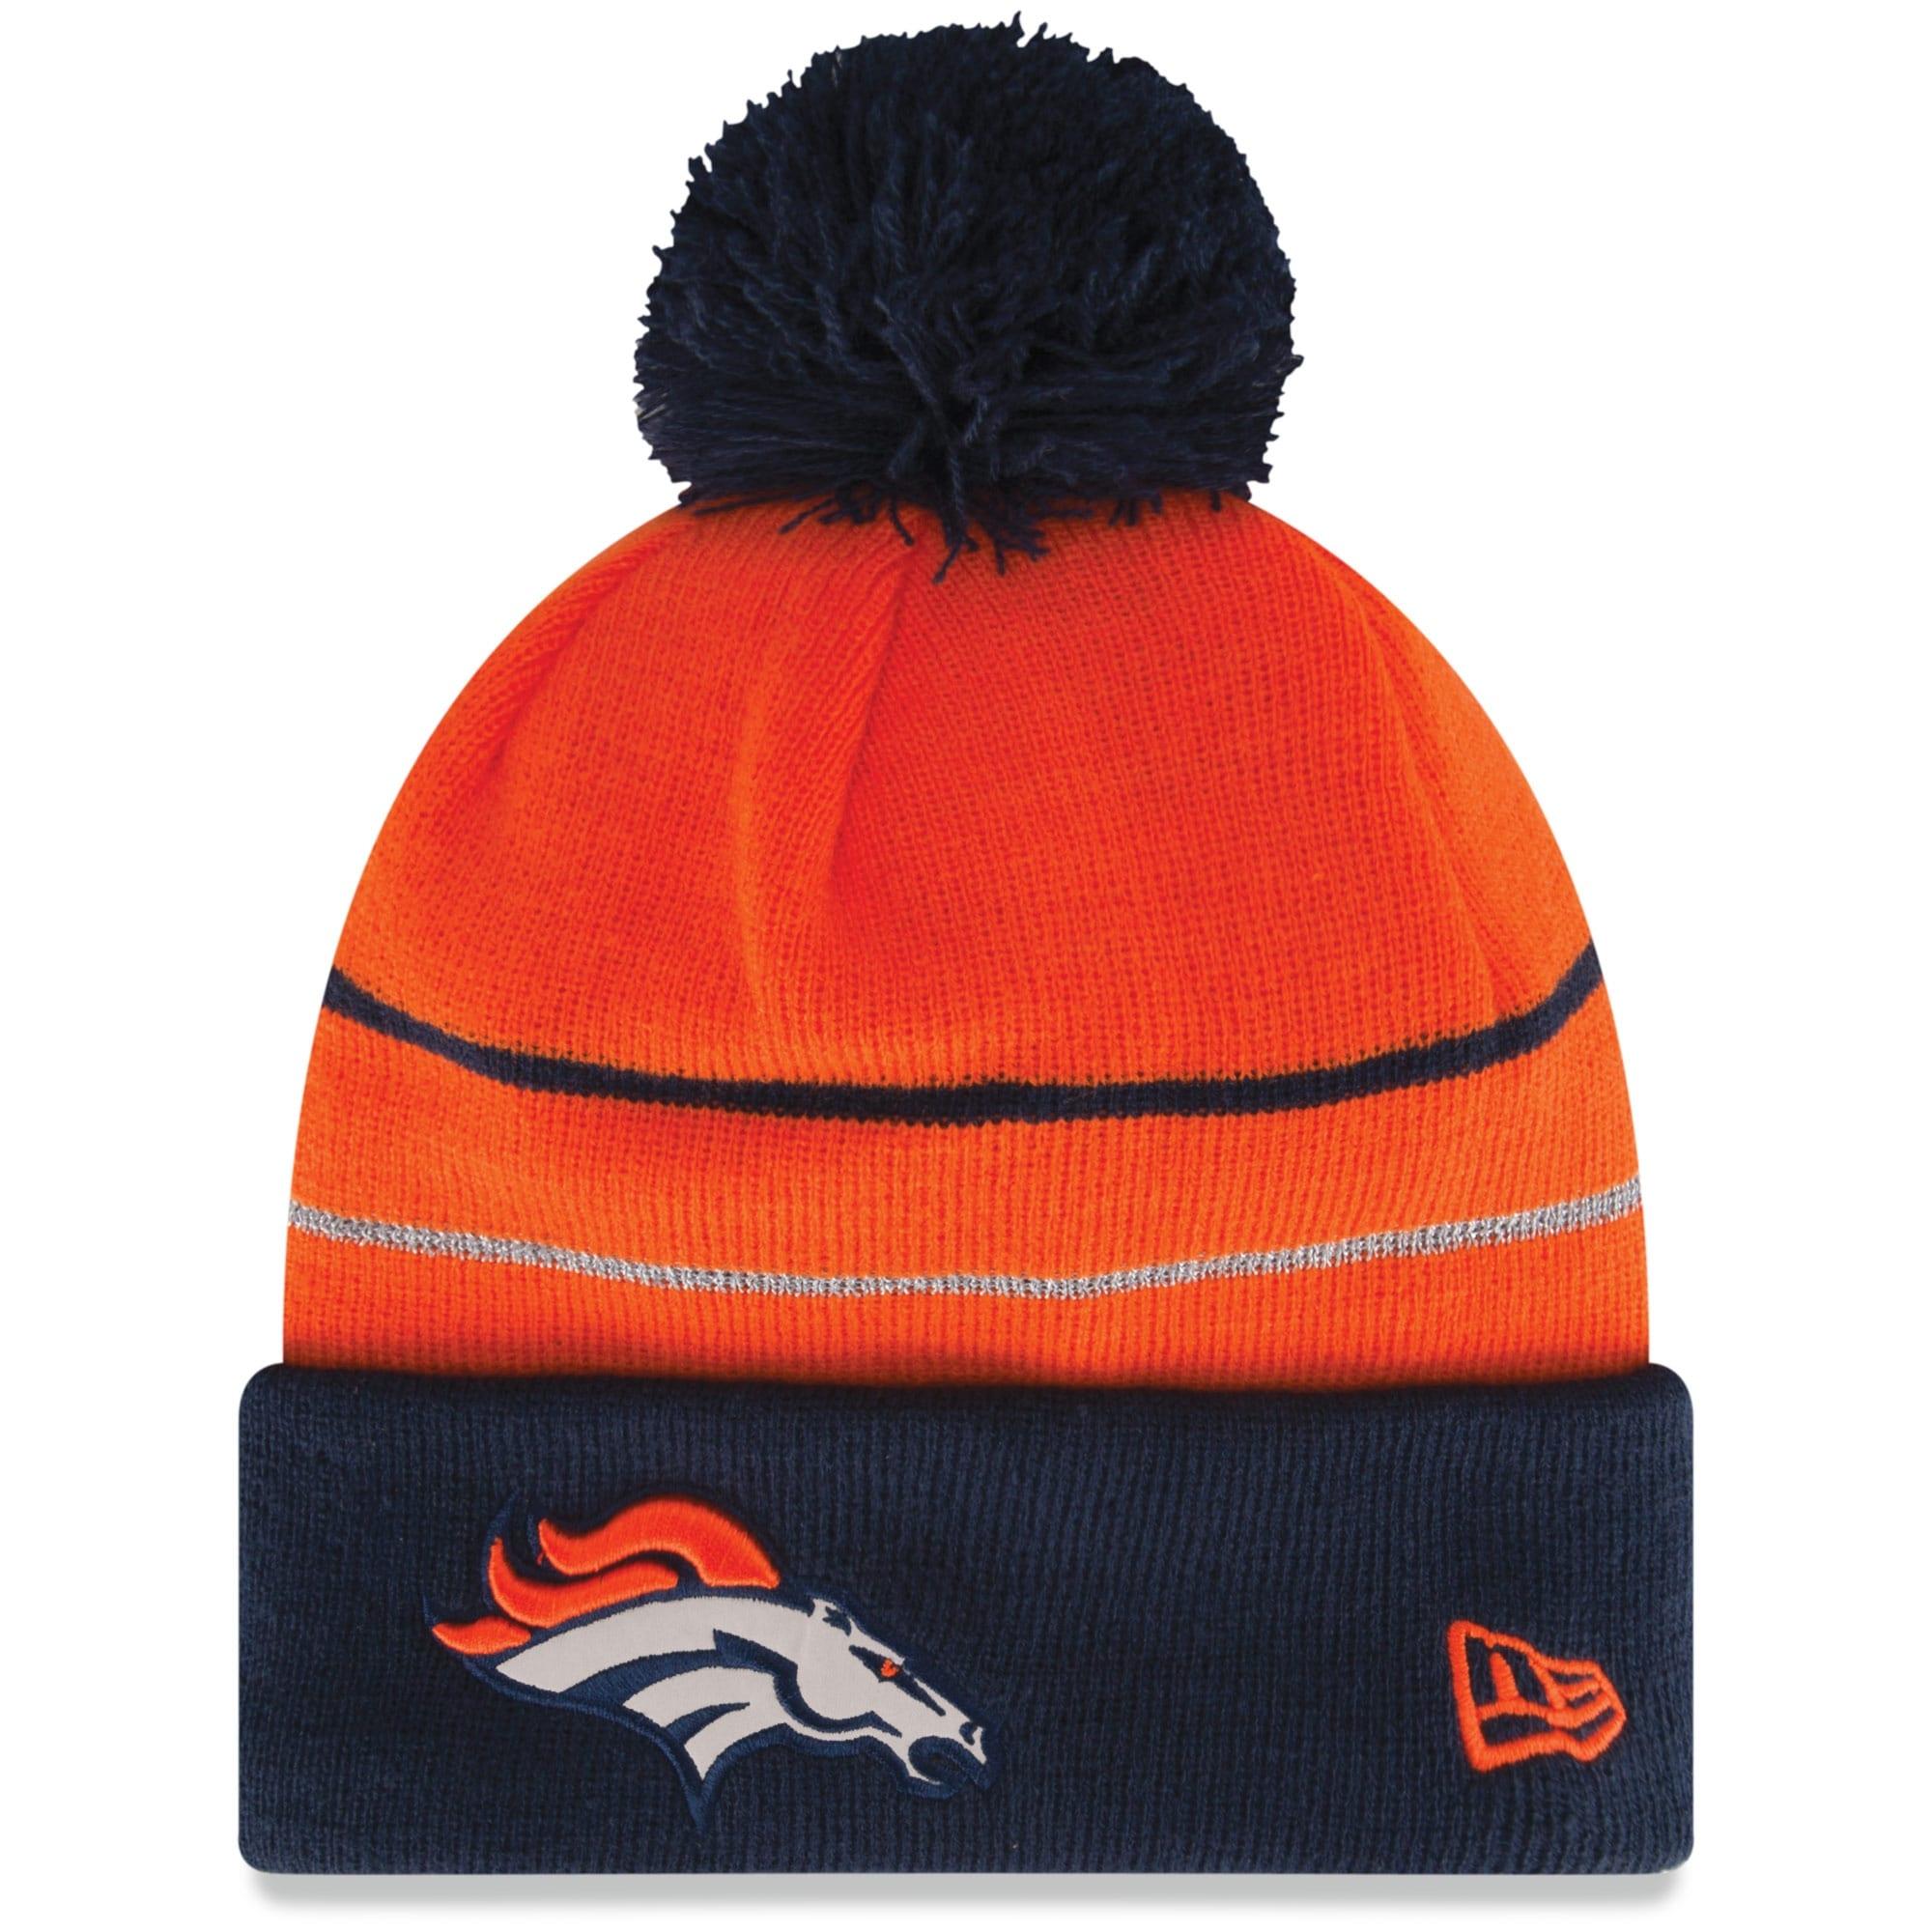 Denver Broncos New Era Two Stripe Cuffed Knit Hat - Orange